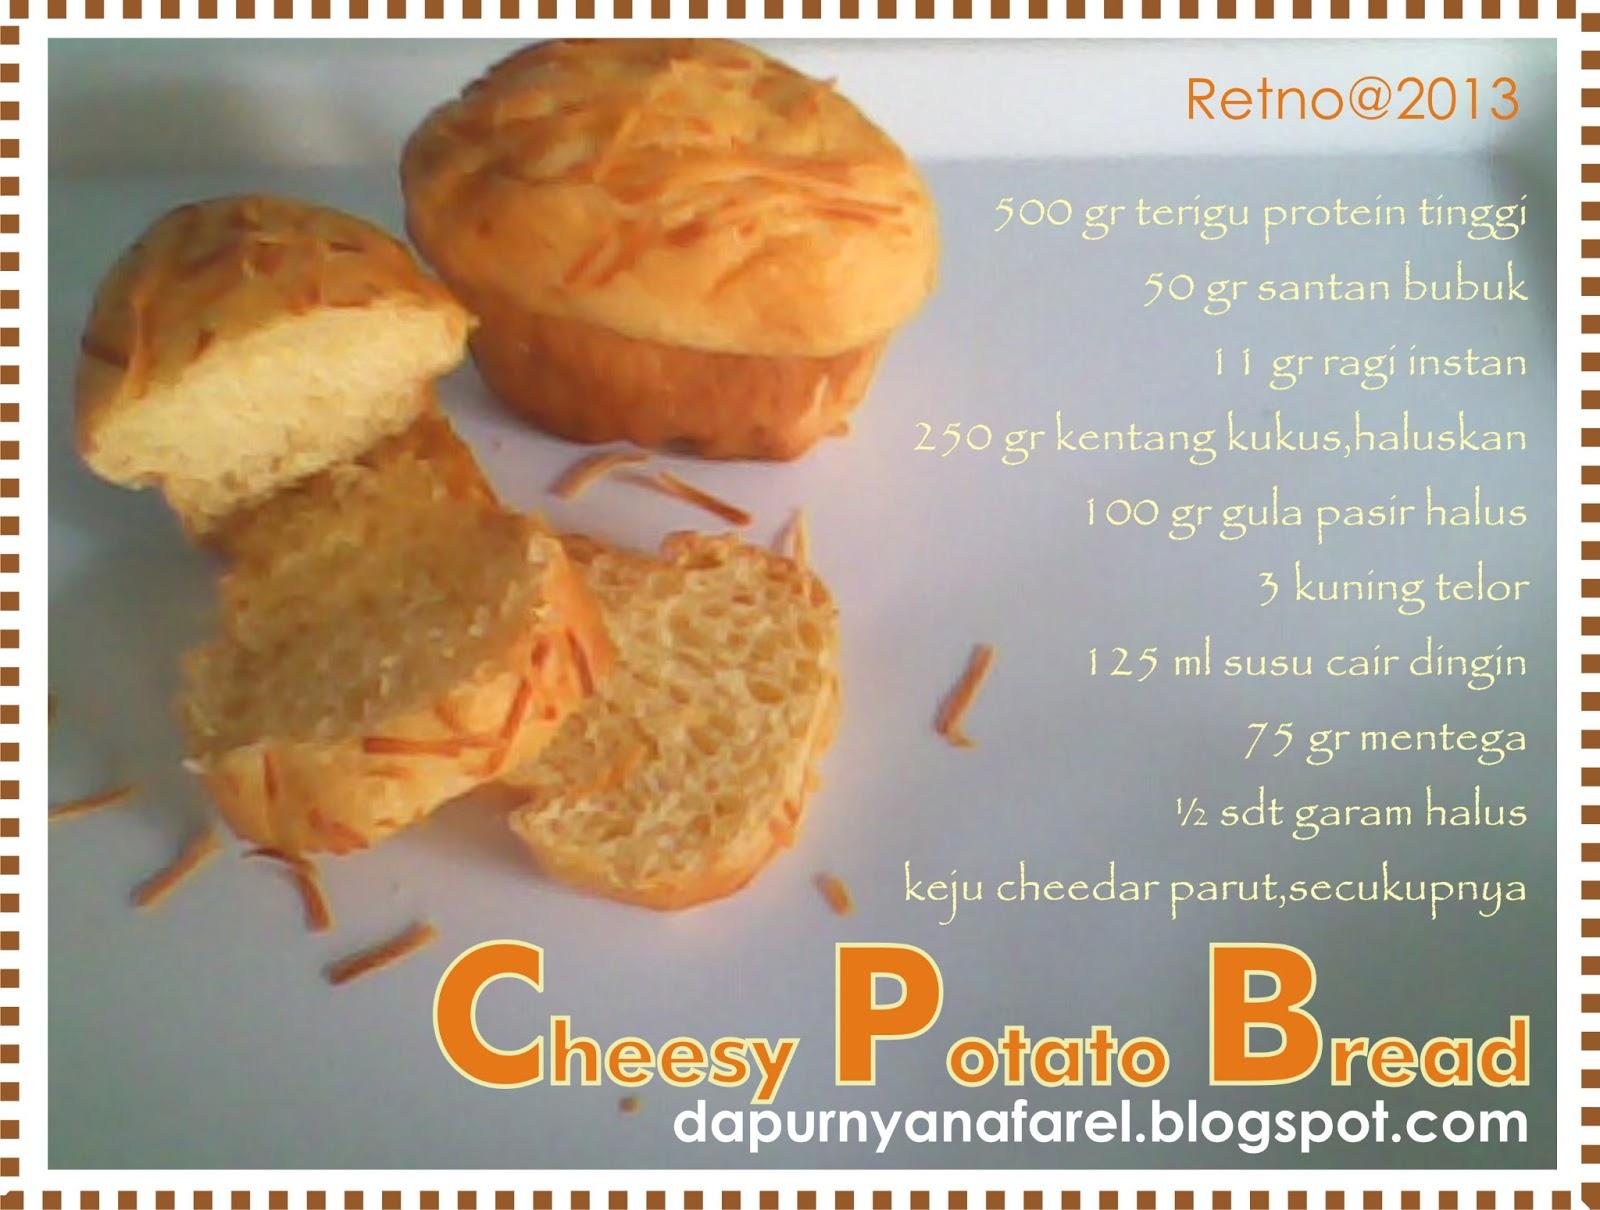 Dapurnya NafaRel: Cheesy Potato Bread